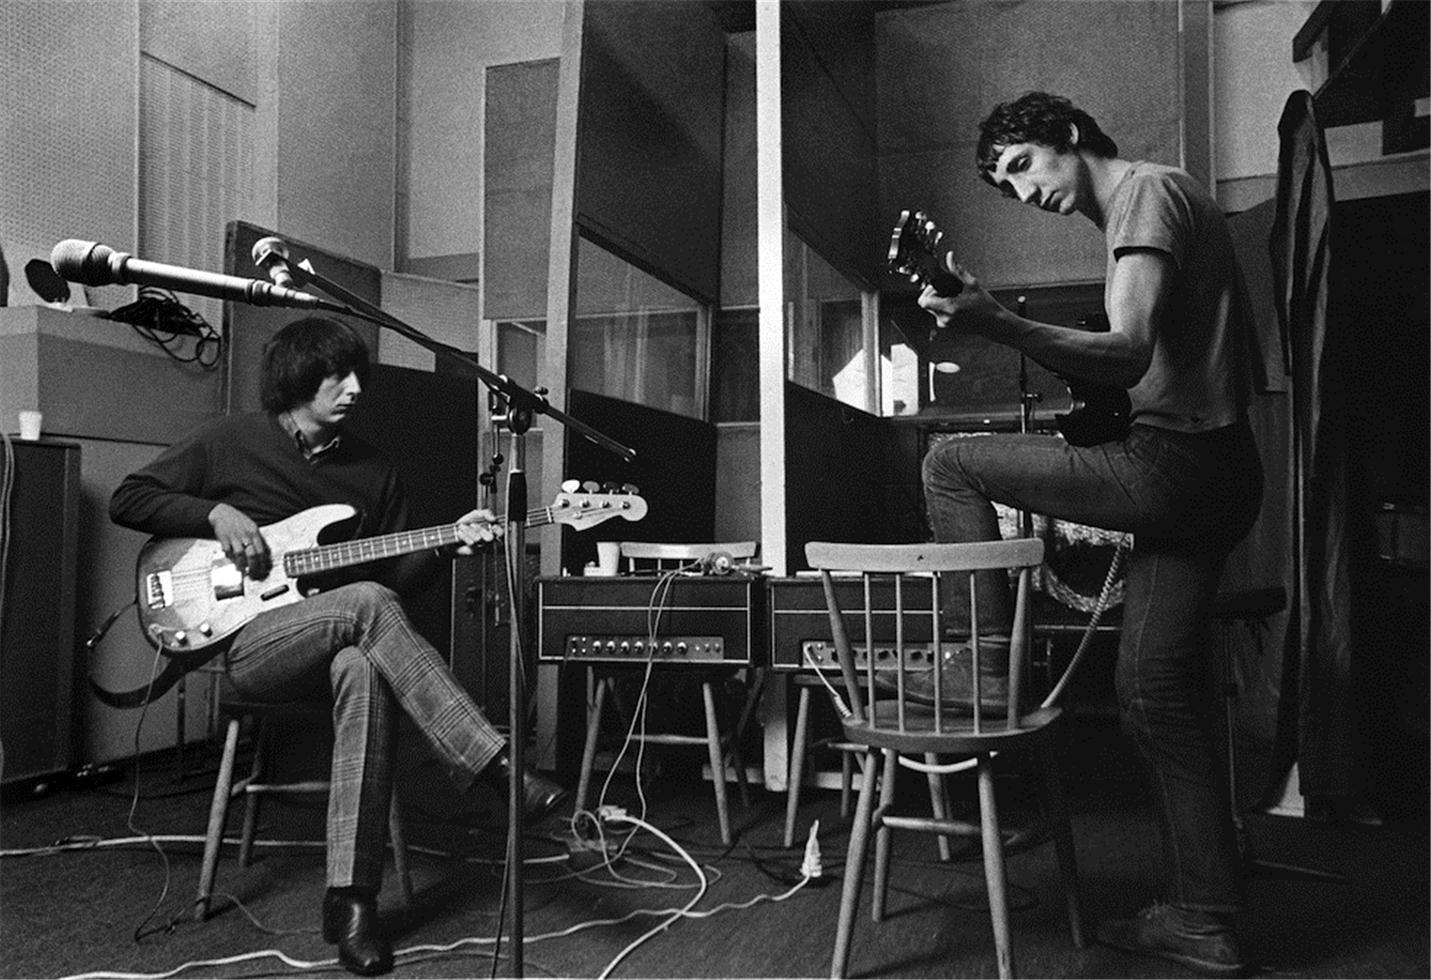 1968. Джон Энтвисл и Пит Таунсенд. Лондон